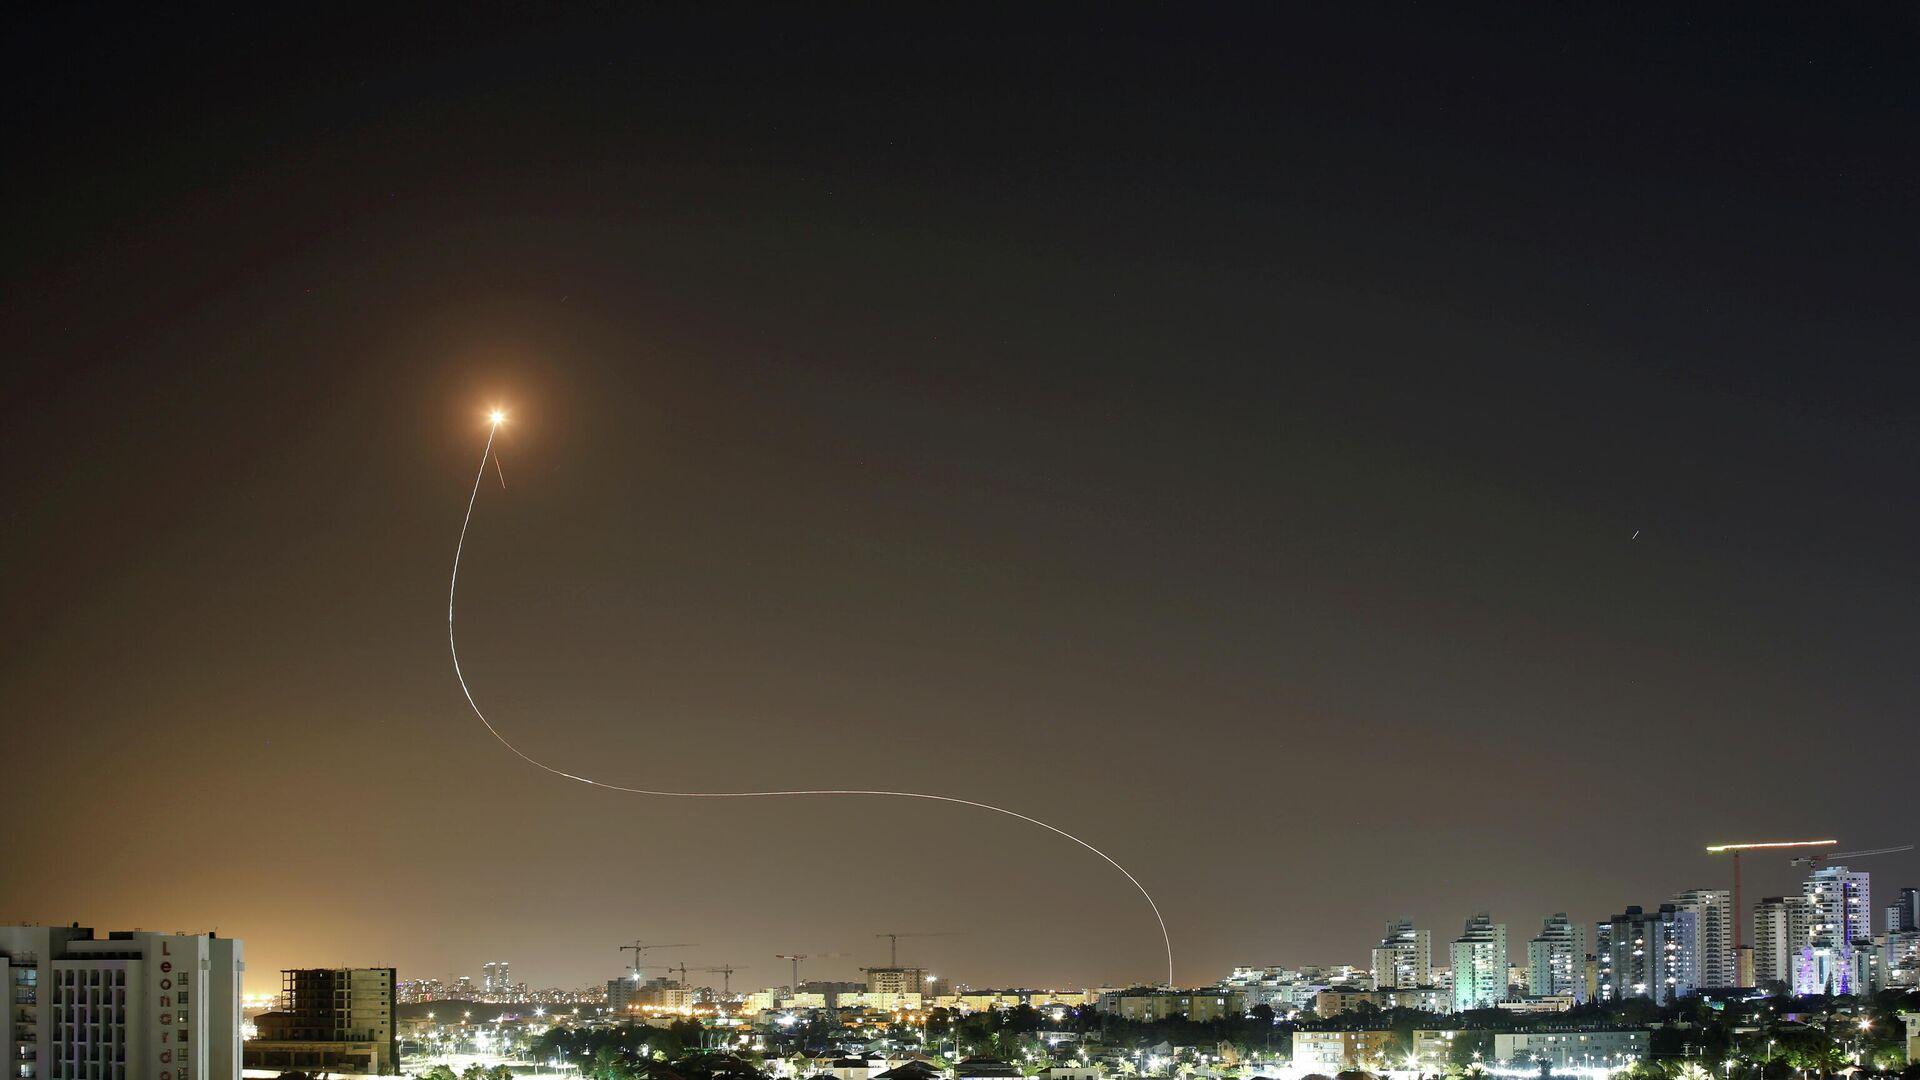 Ataque aéreo a Israel - Sputnik Mundo, 1920, 11.05.2021